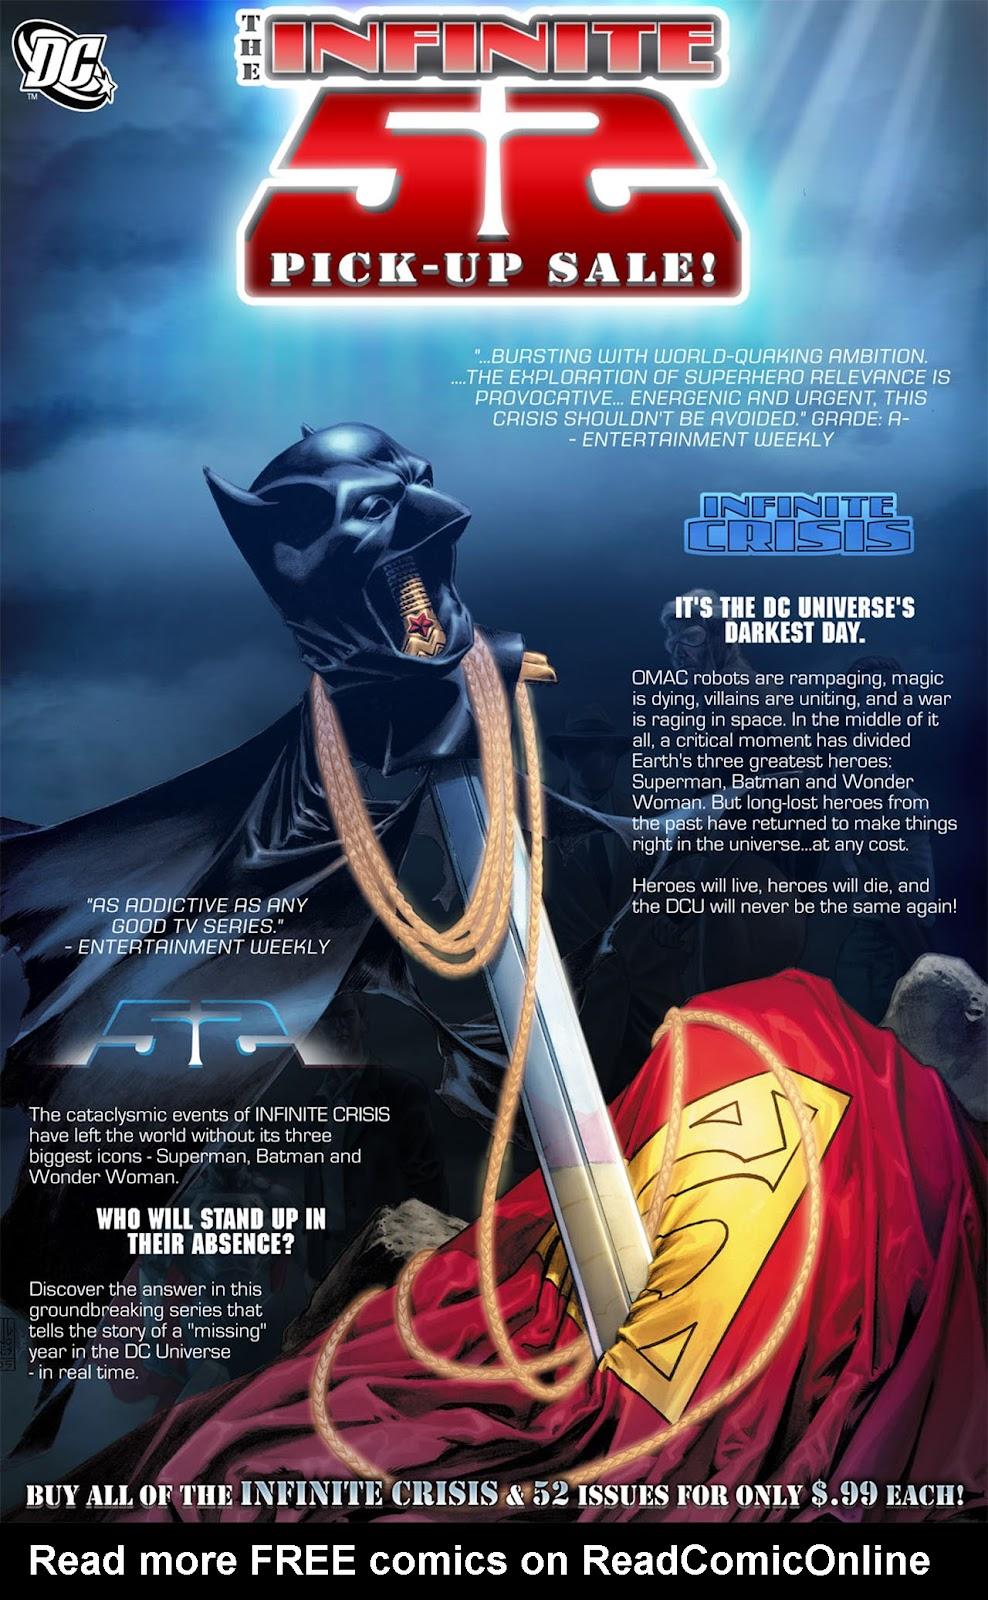 Comic World War III issue 3